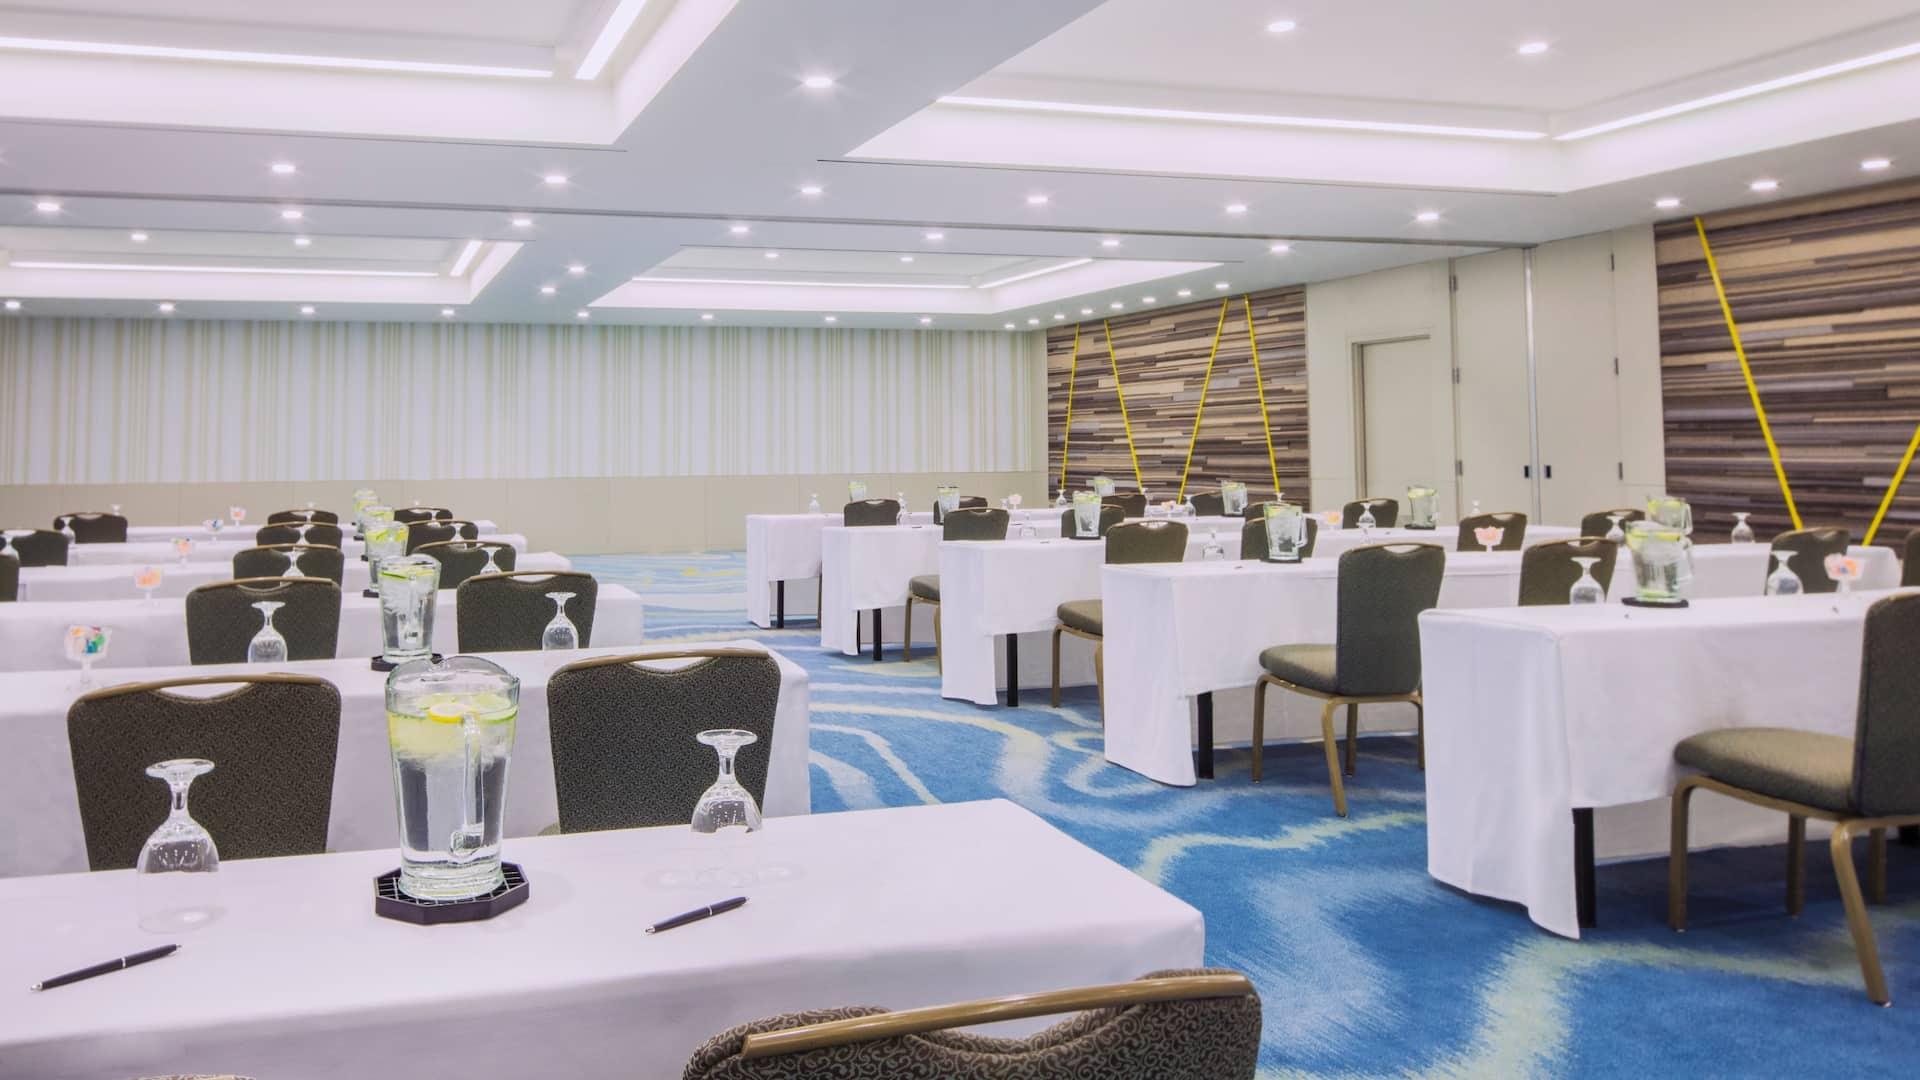 Seaview ballroom classroom